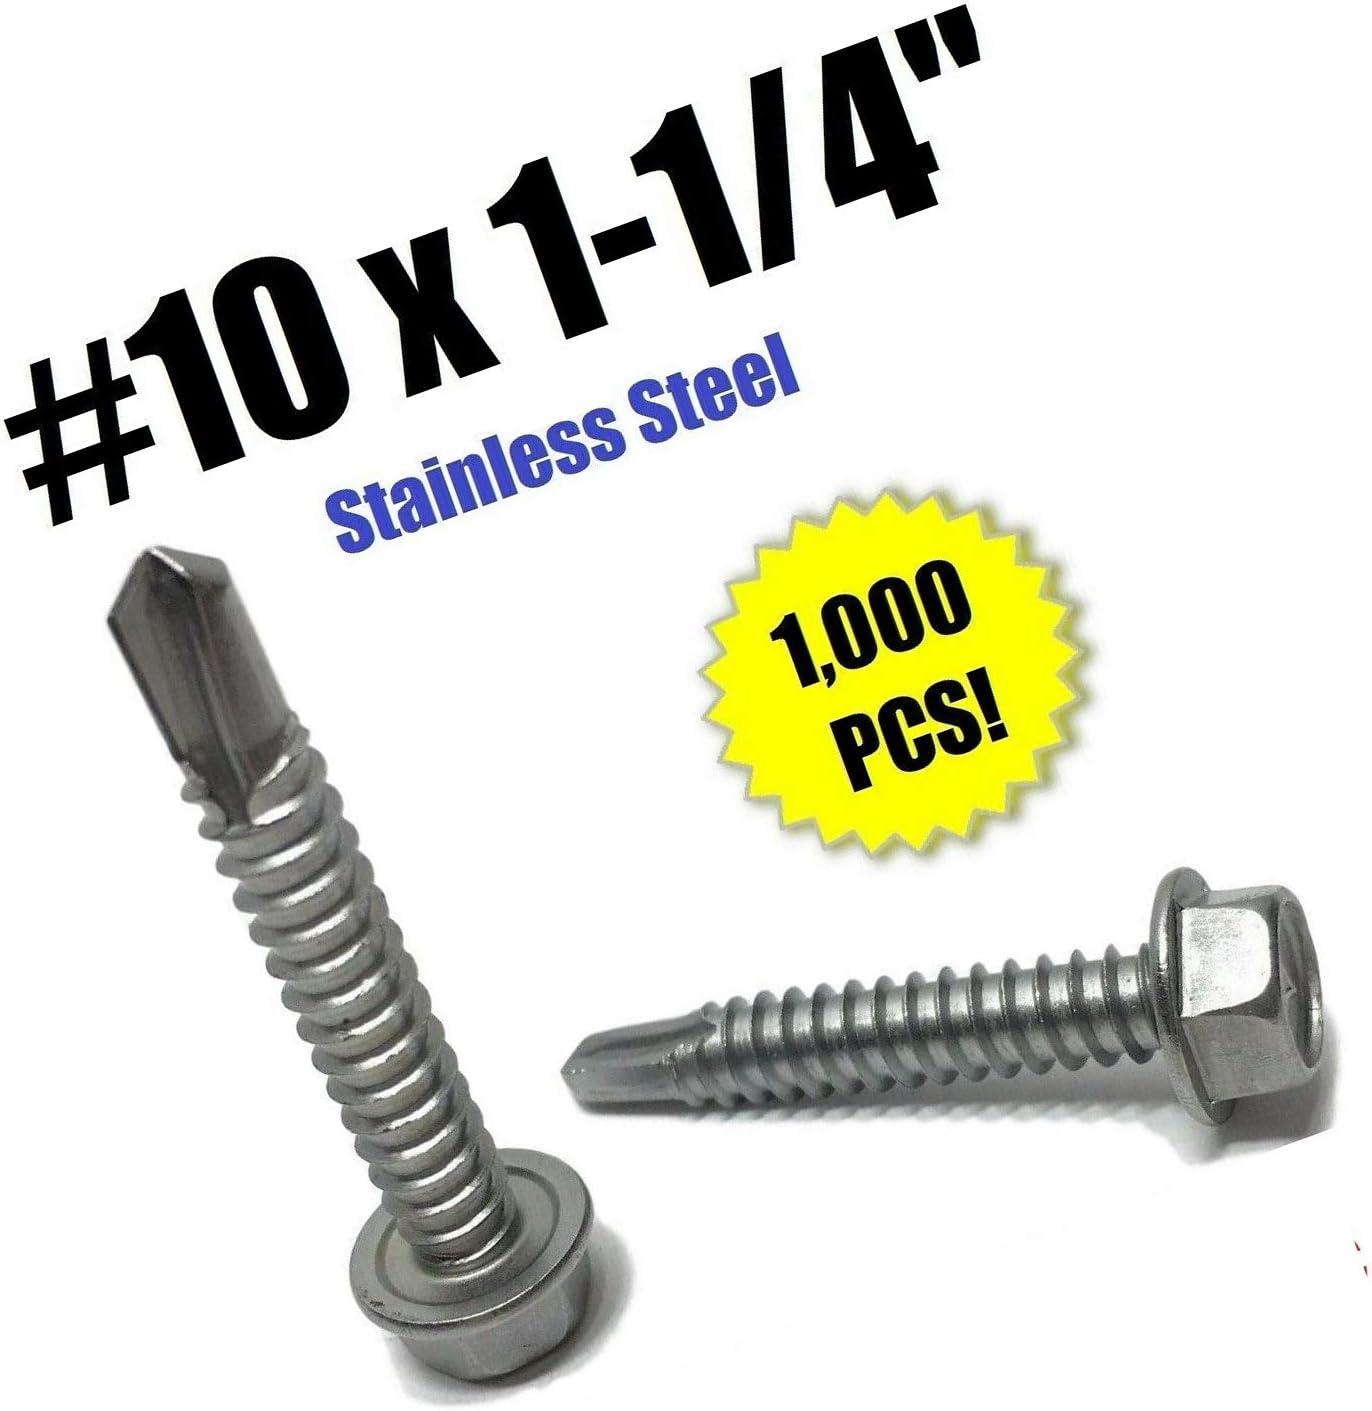 "#10 X 1-1/4"" Hex Washer Head selbst Drilling Tek Screw Stainless Steel (Qty 1000) Grade Metric Hardware Fastener Kit"